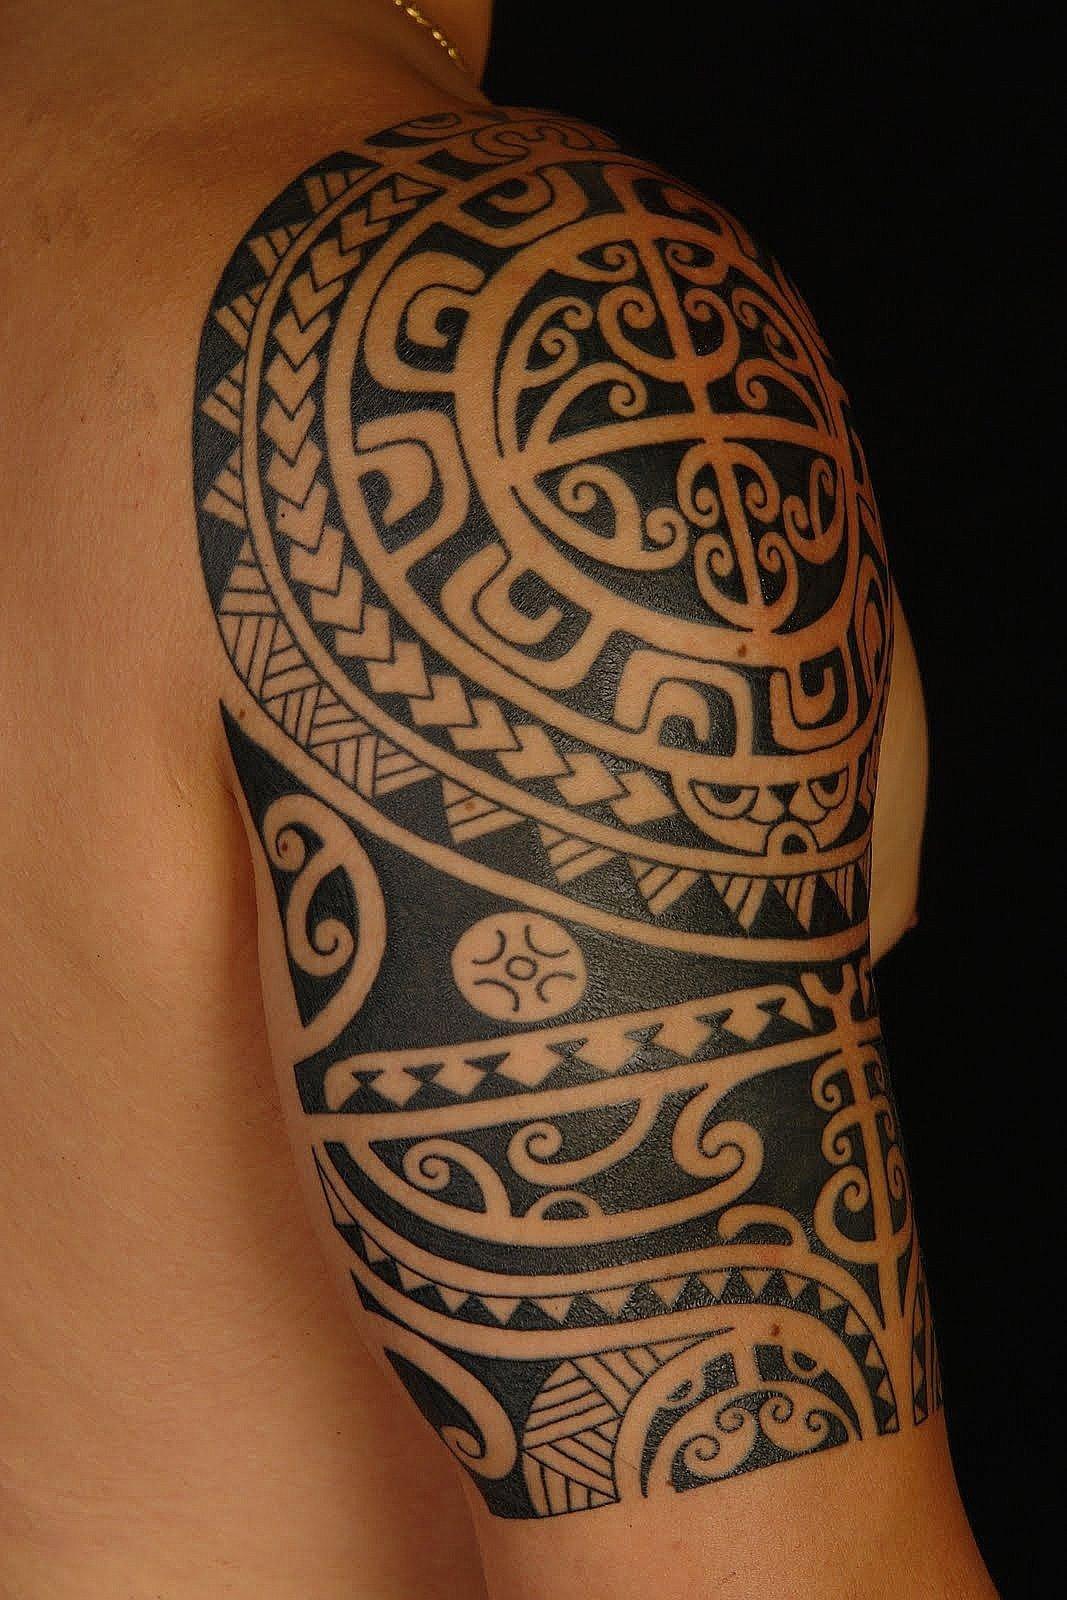 10 Lovable Shoulder Tattoo Ideas For Men tribal tattoos for guys tattoo shoulder and guy 1 2021